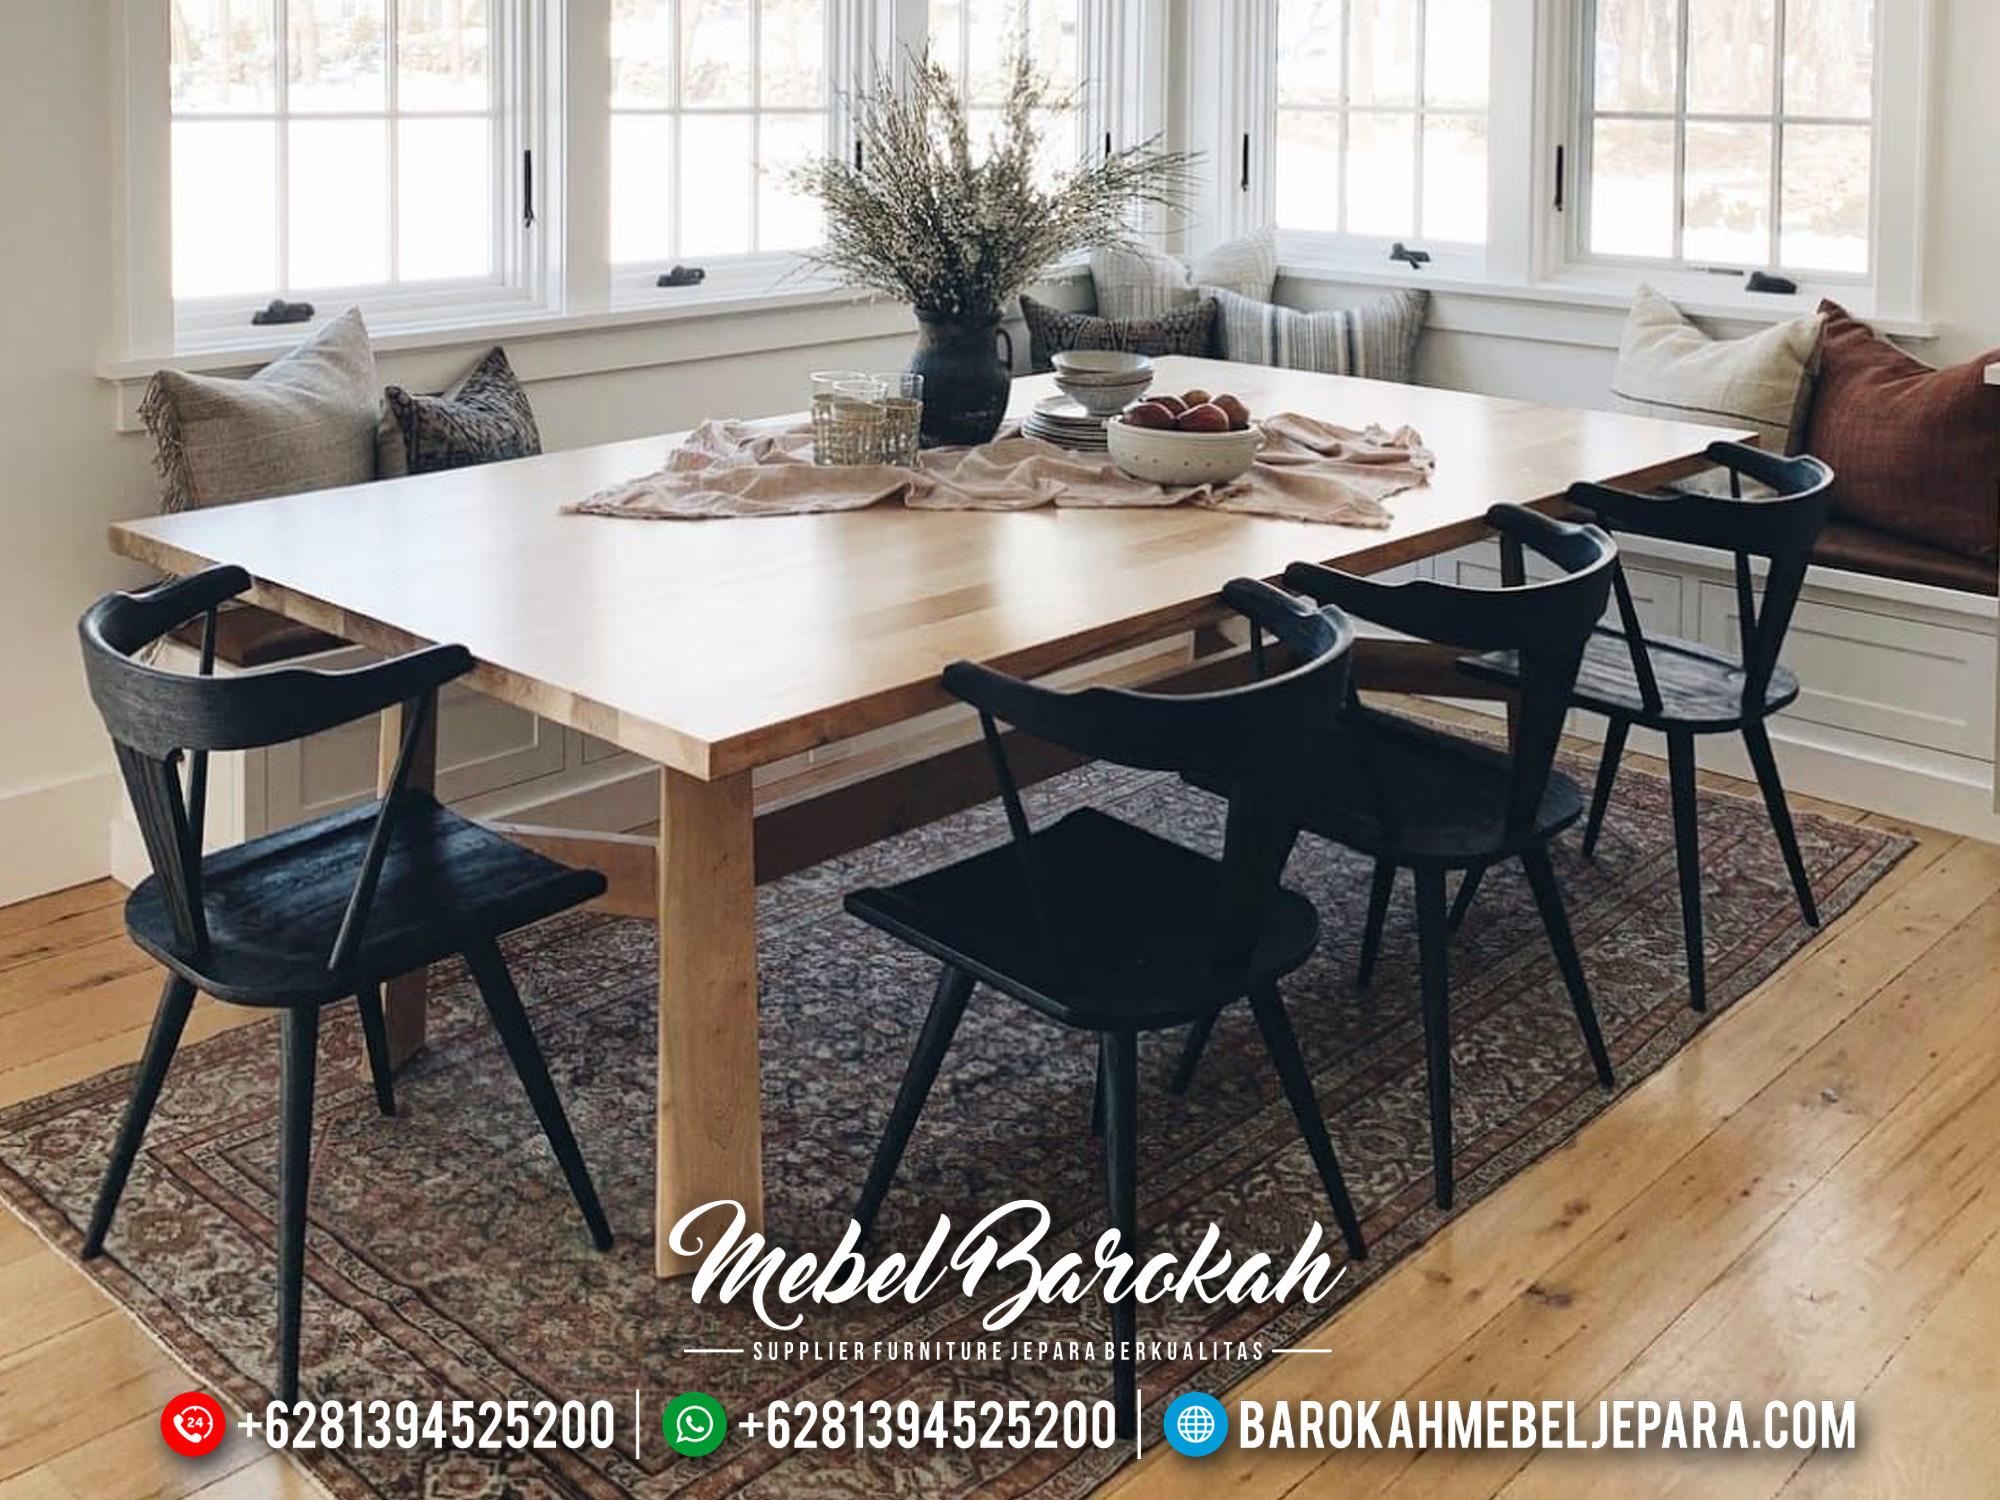 Desain Kursi Cafe, Kursi Cafe Retro, MB-0232